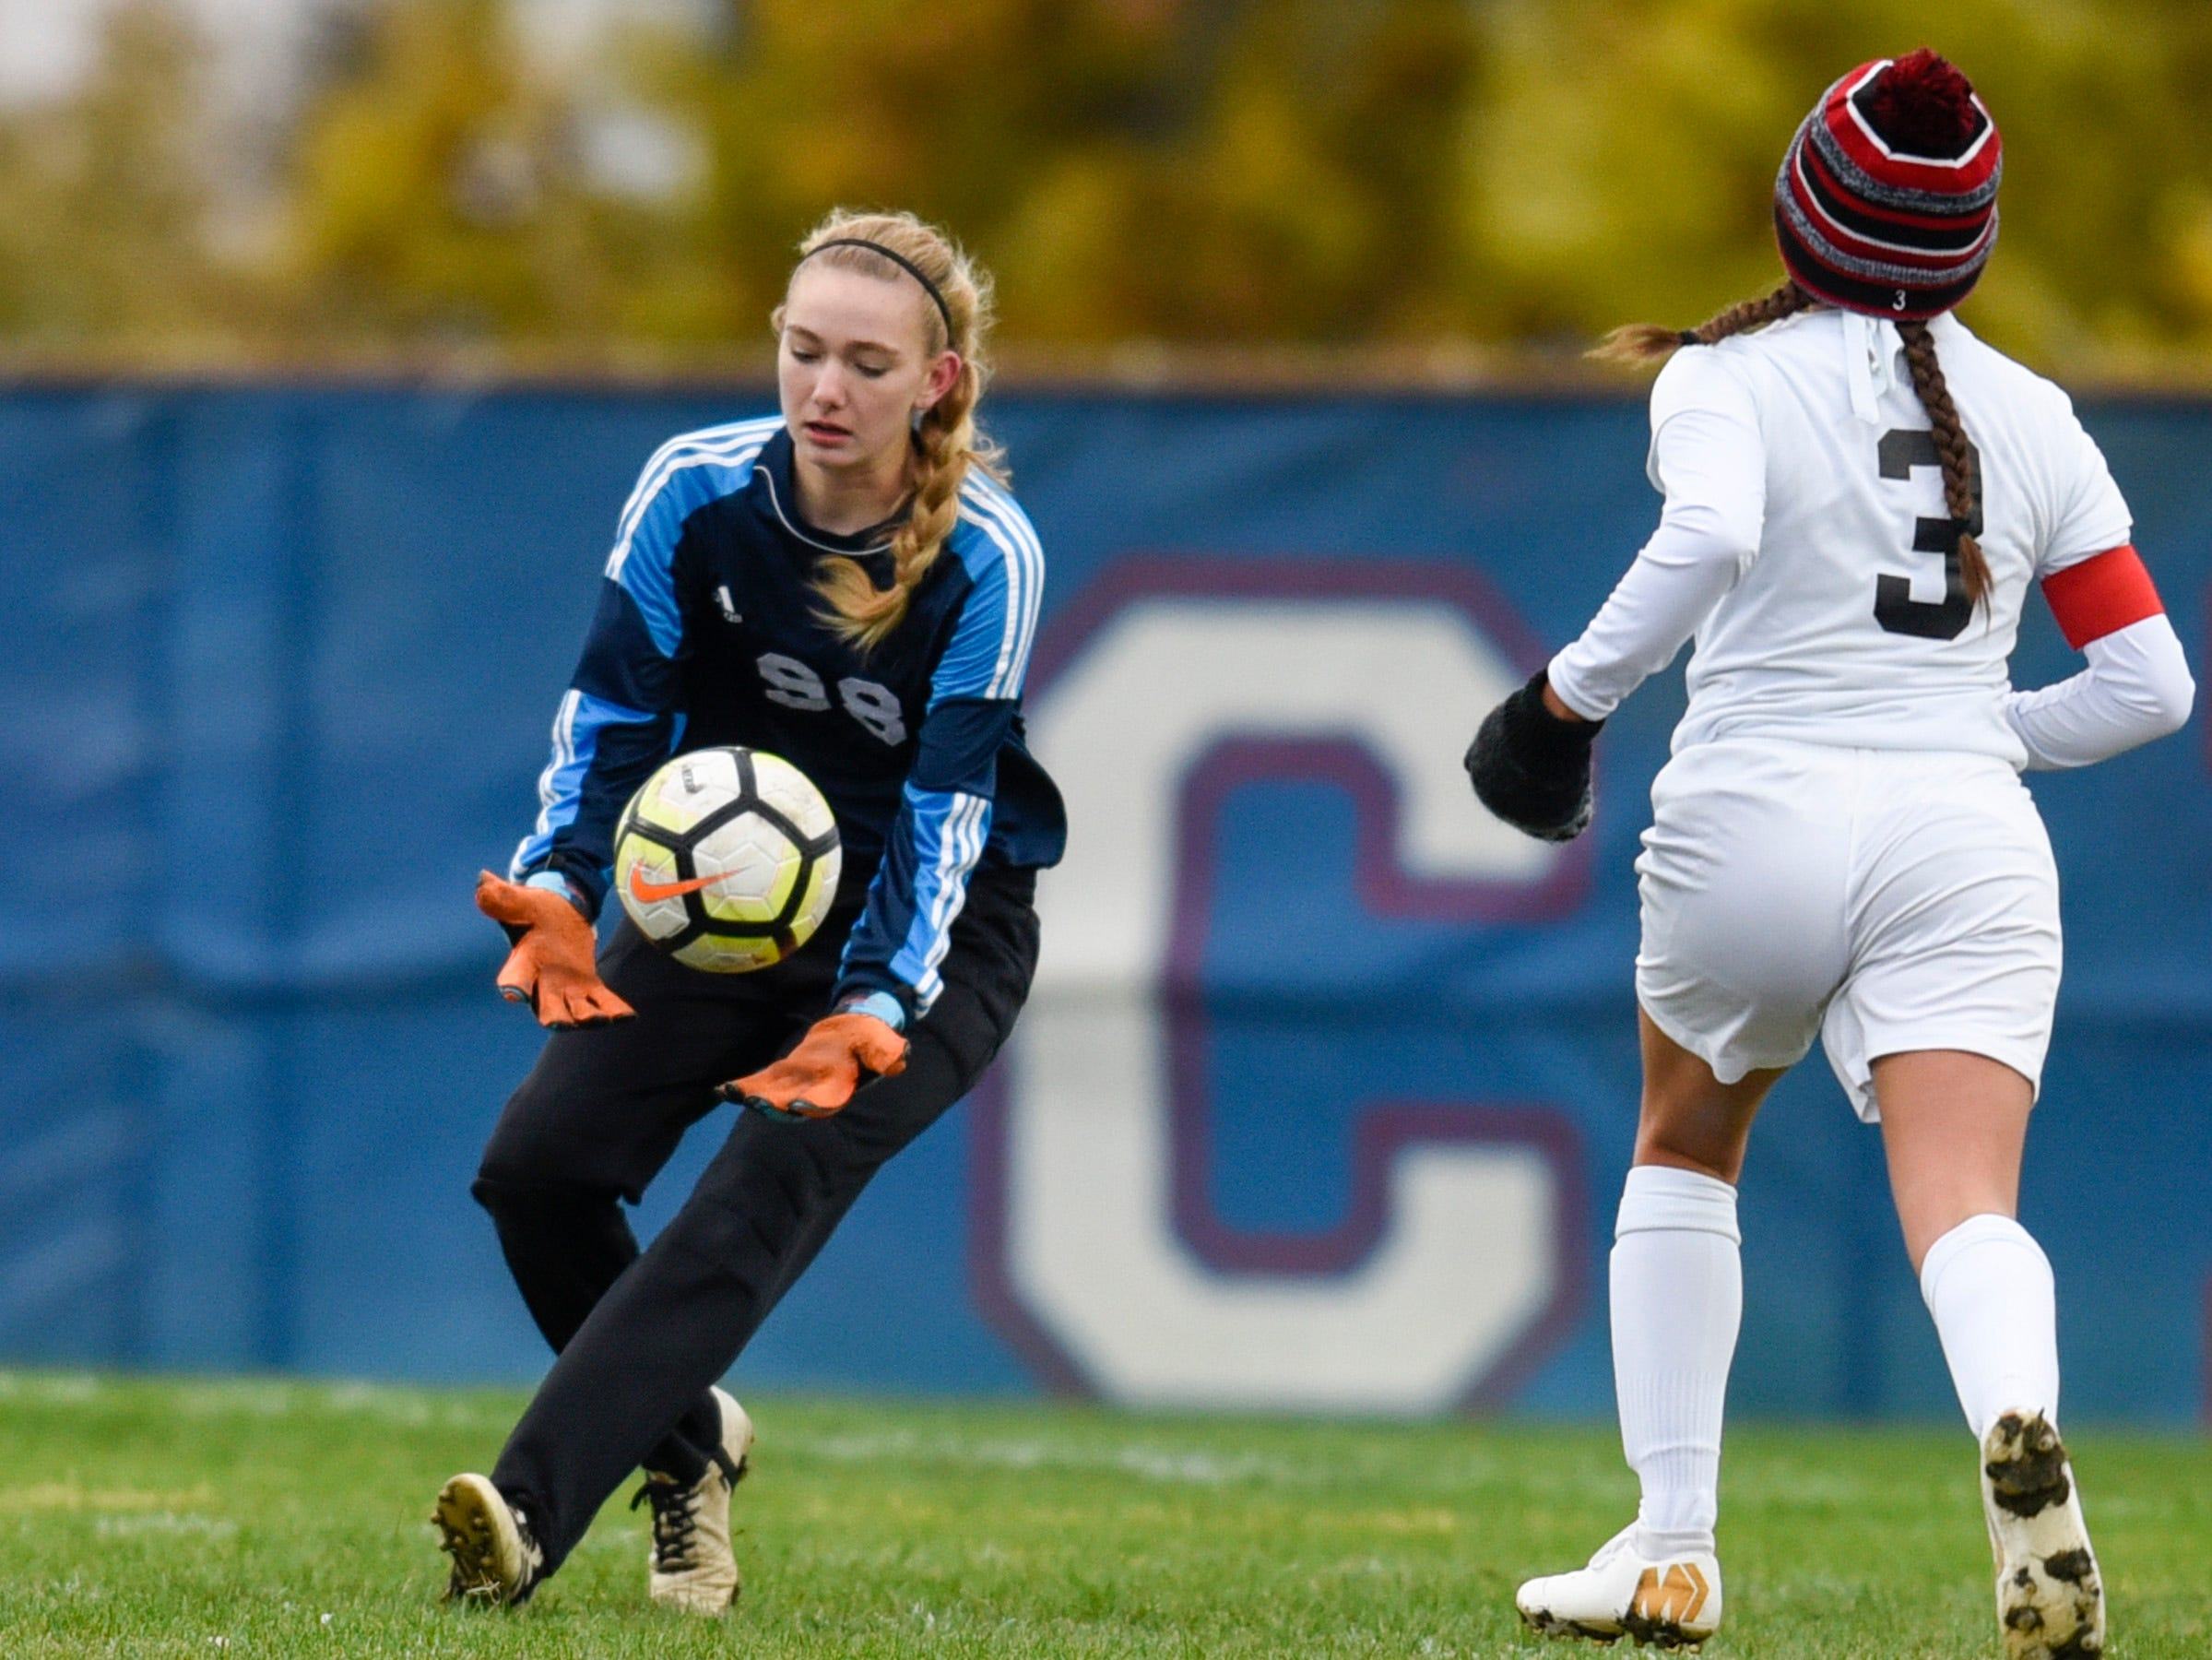 Apollo goalie Megan Vasek makes a stop against ROCORI during the first half Thursday, Oct. 11, at Apollo High School.